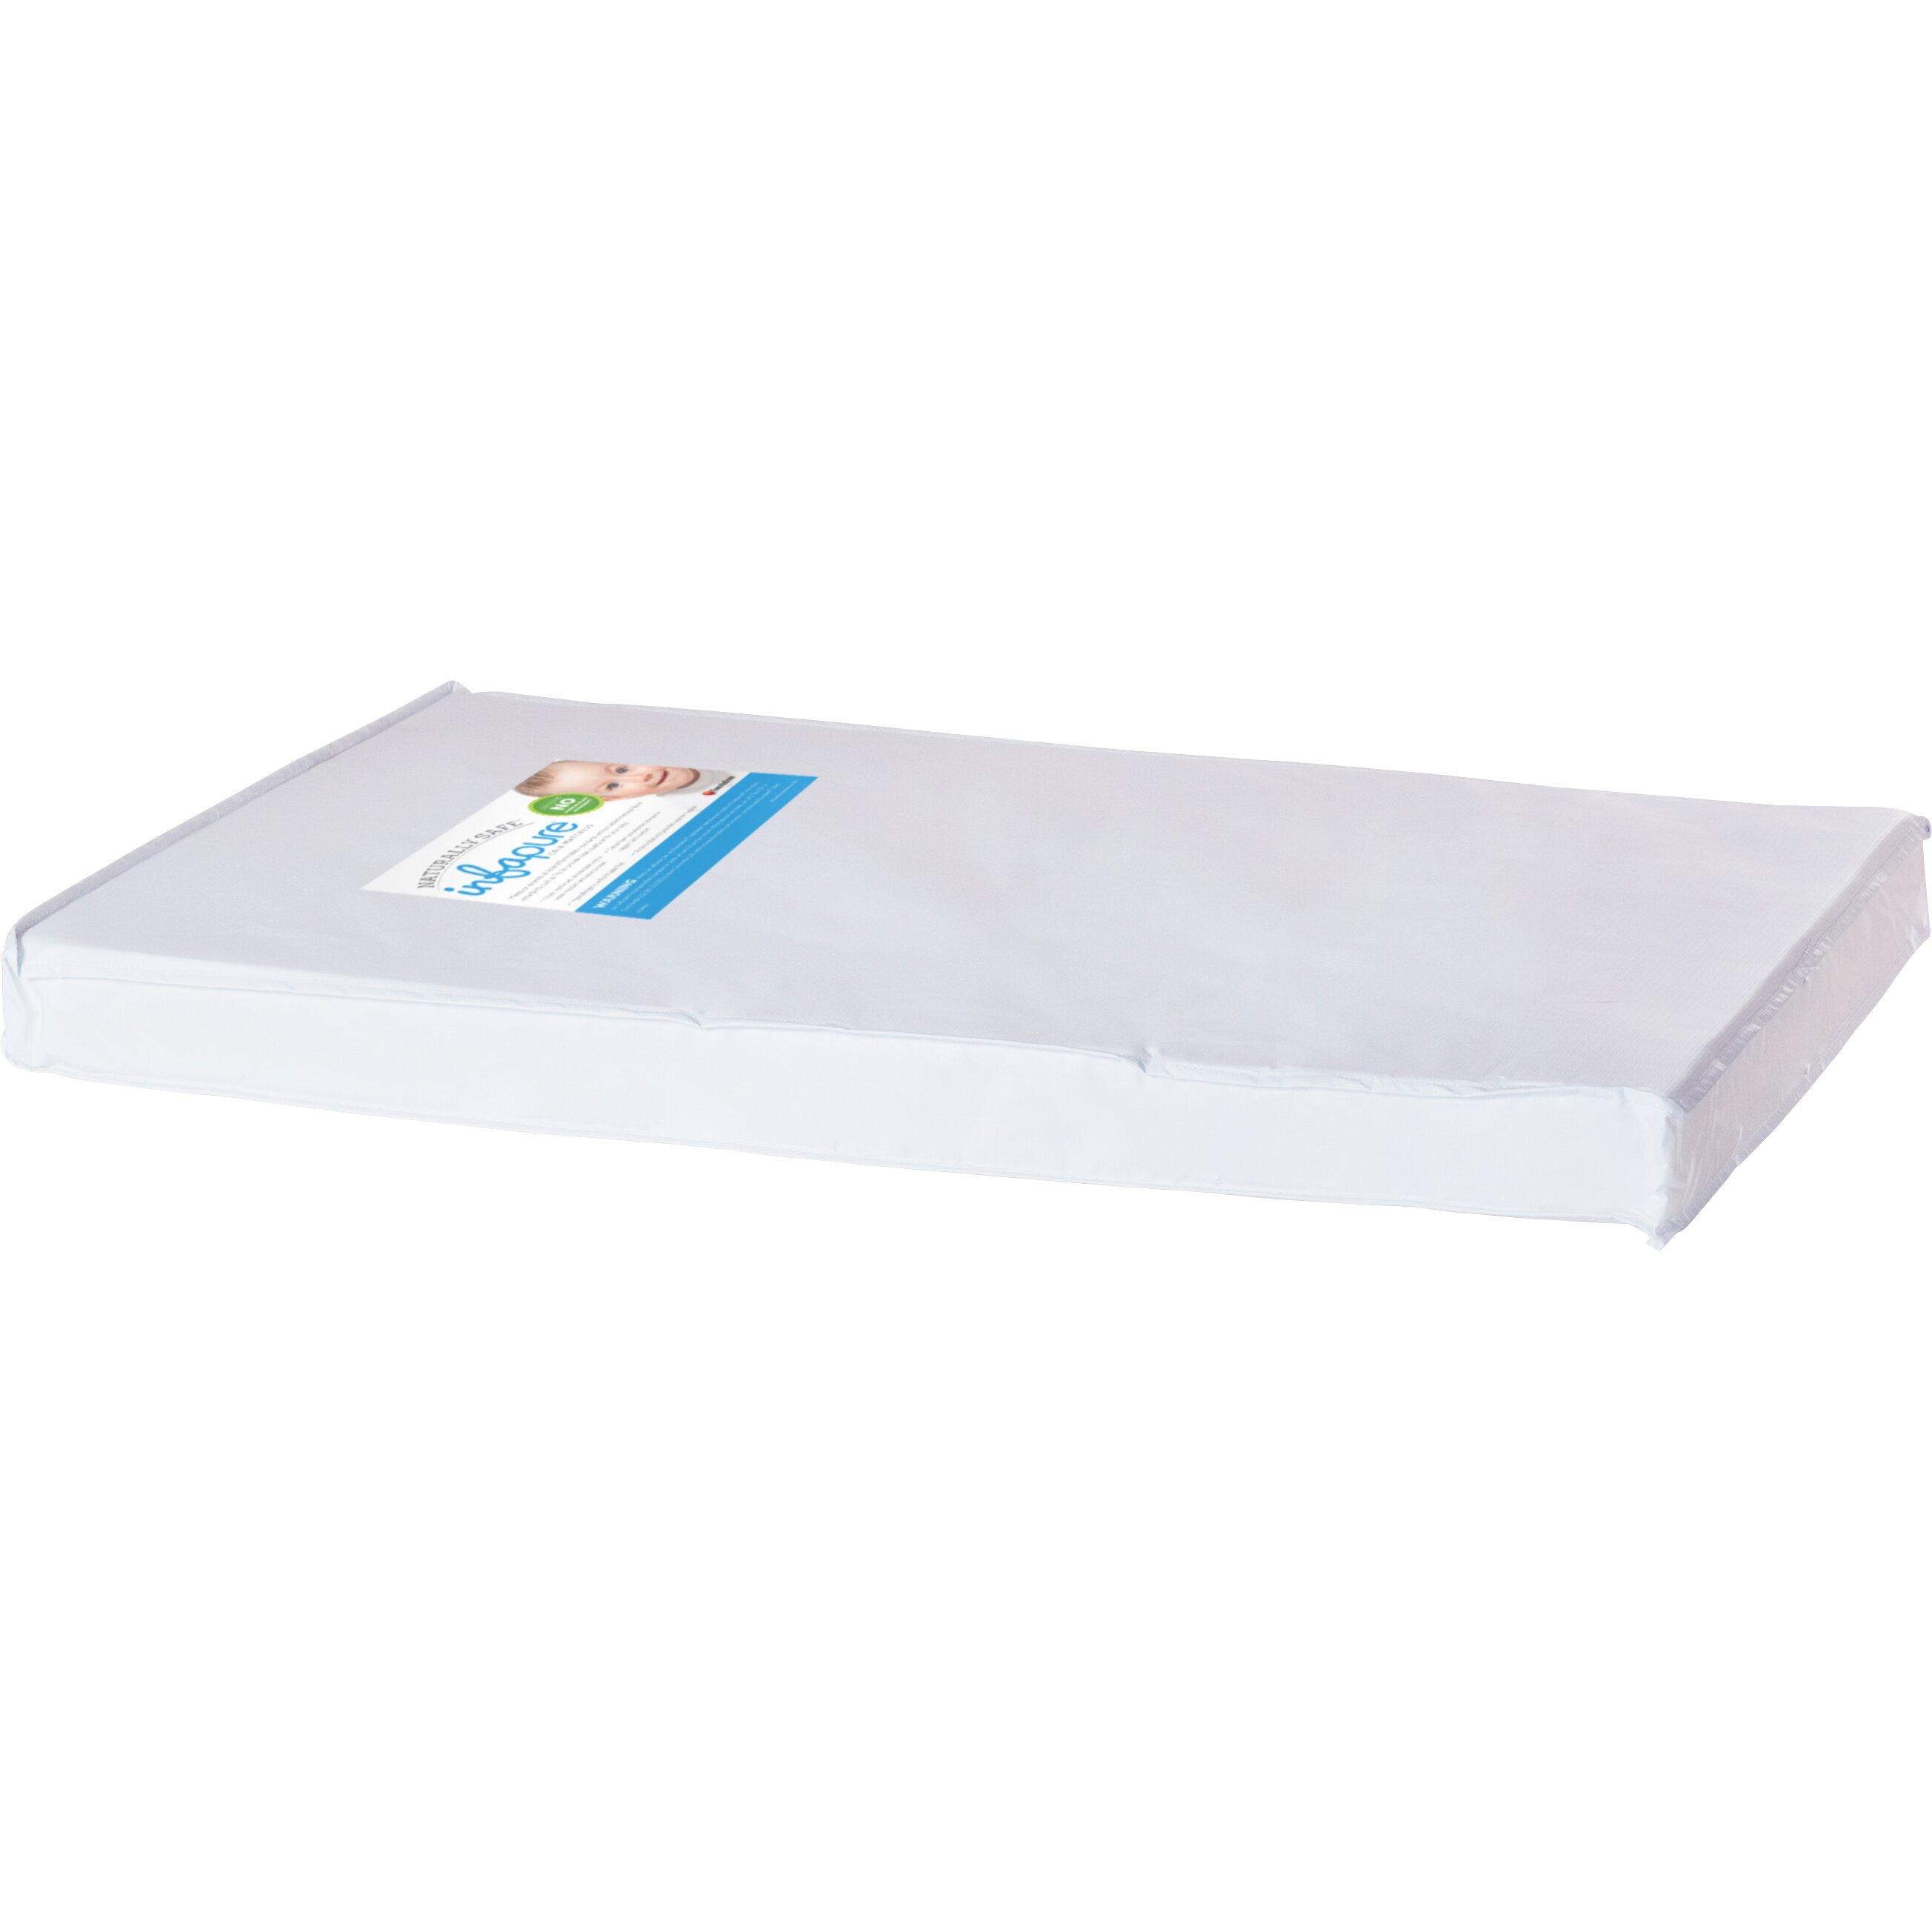 Crib mattress - Foundations Infapure 3 Quot Compact Crib Mattress